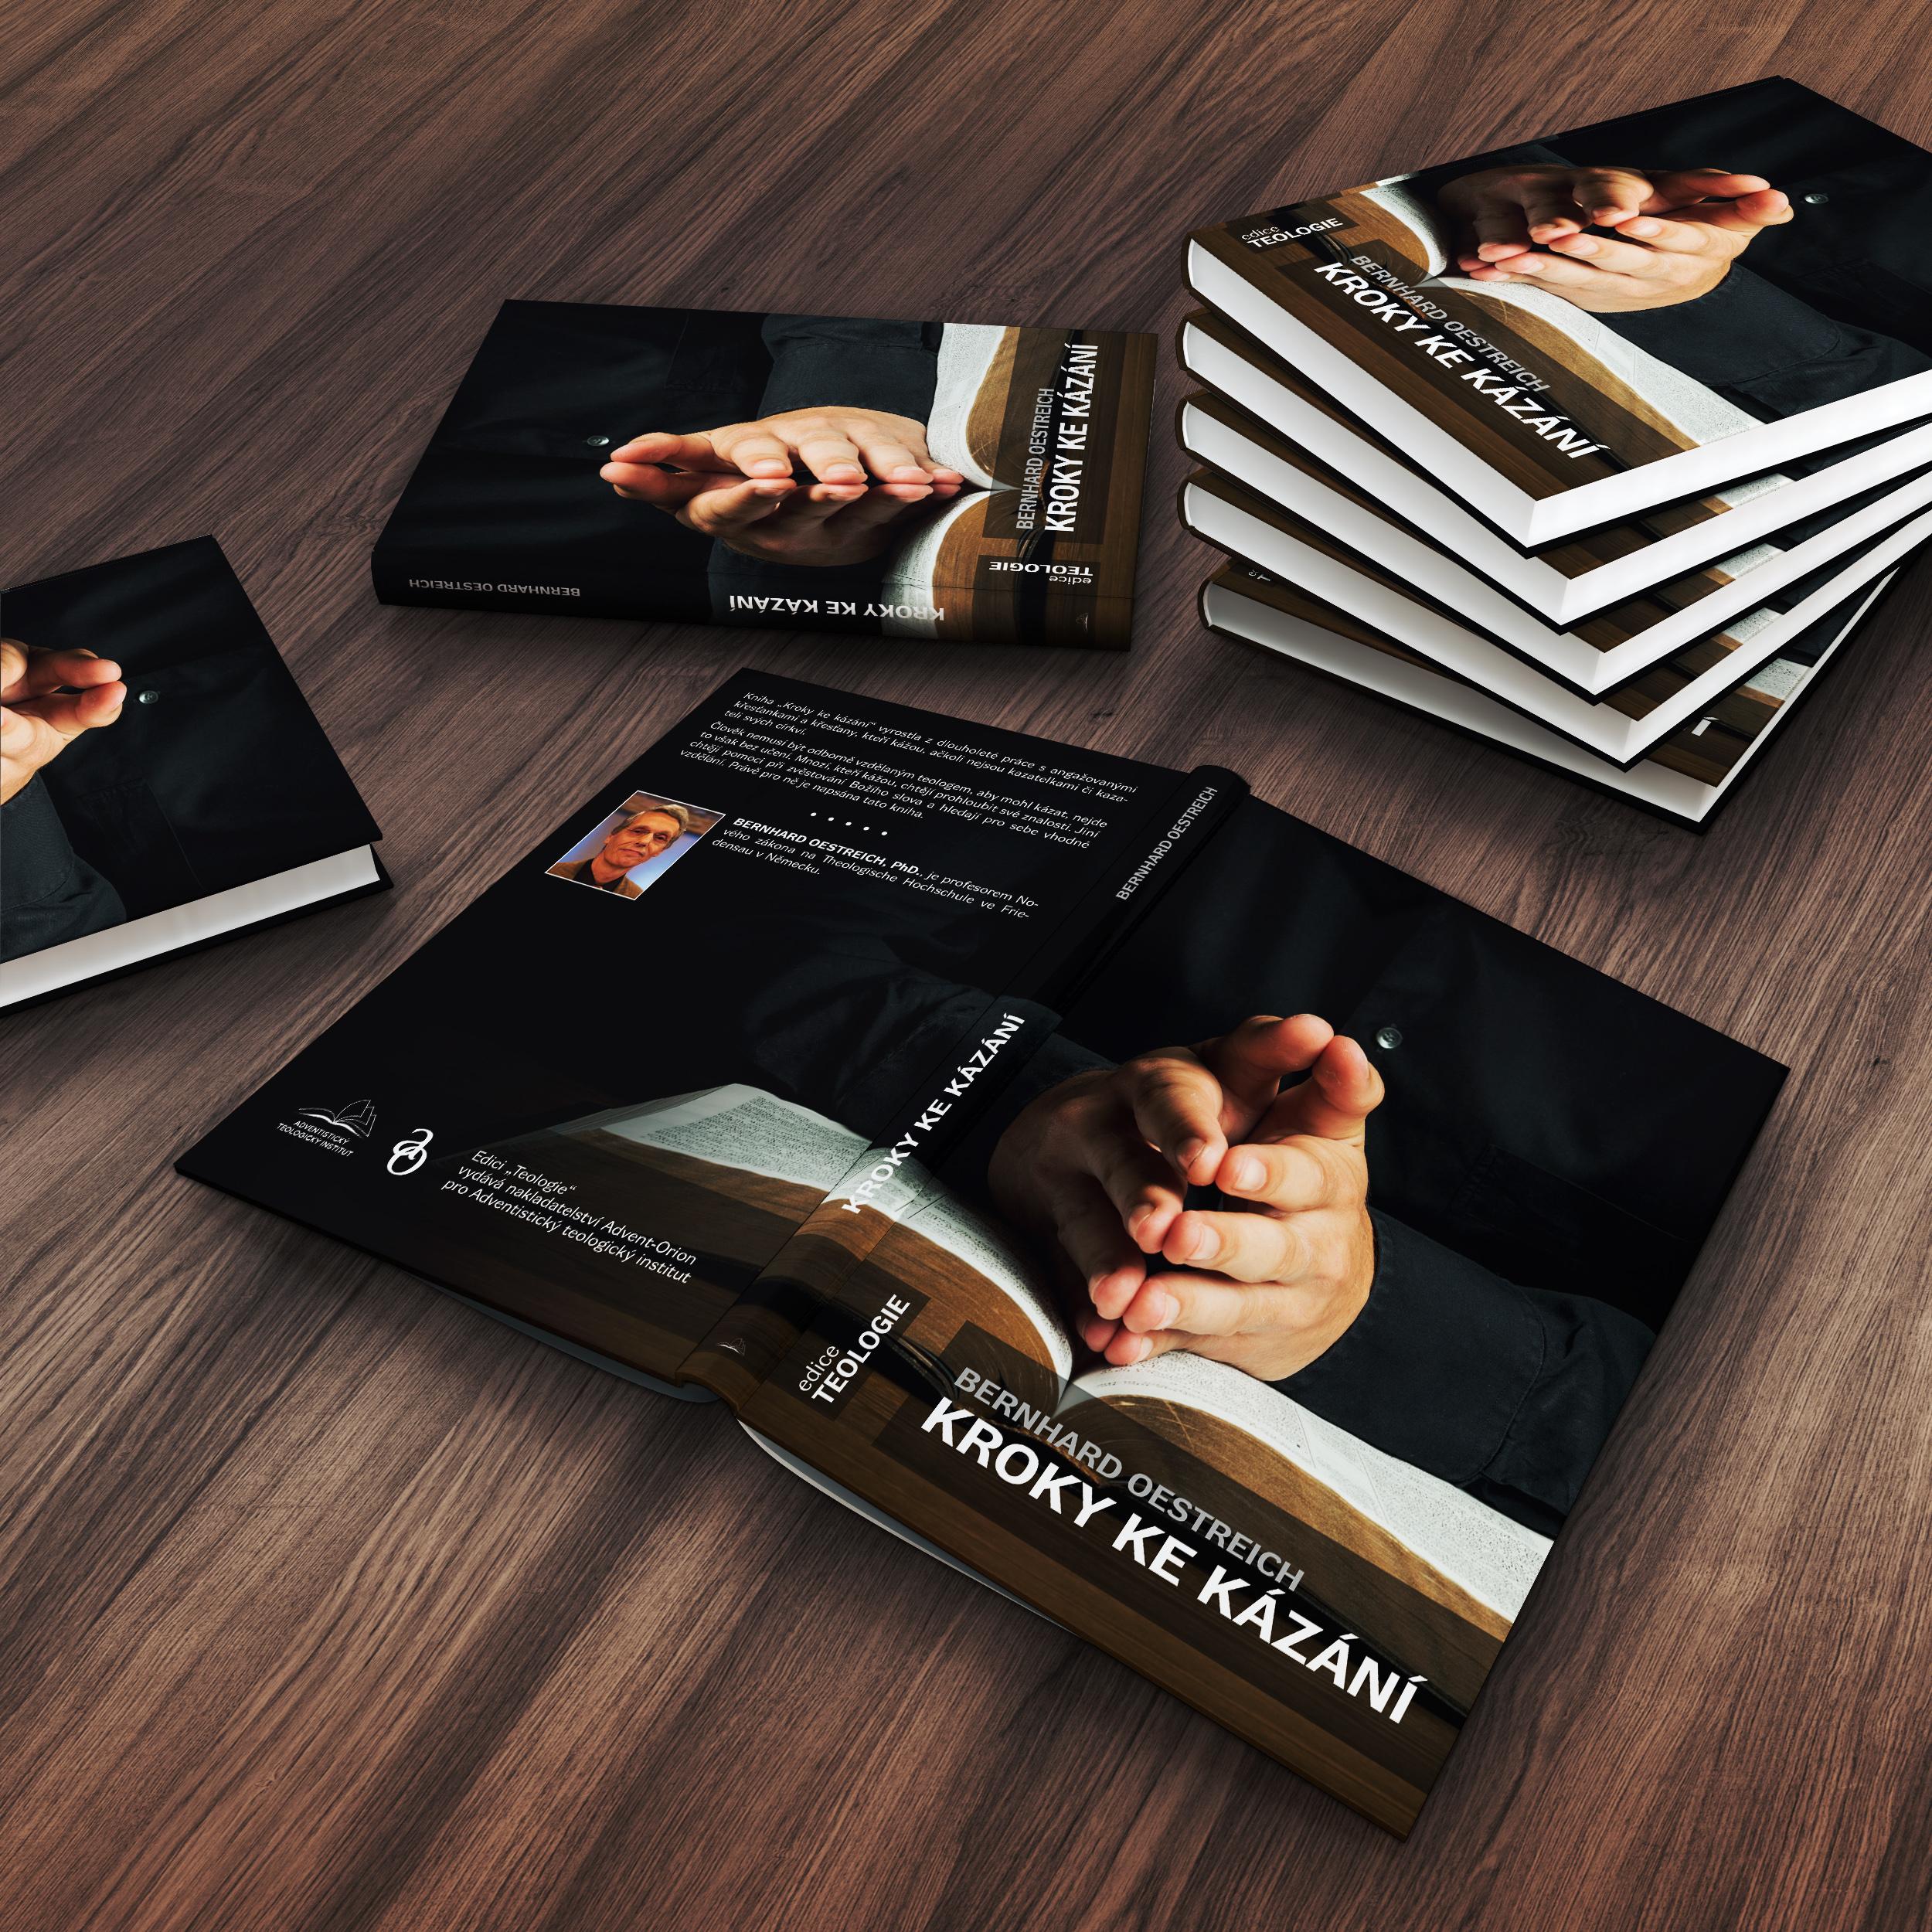 Adventistický Teologický Institut – Adventistický Teologický Institut 7ff2eb40a2